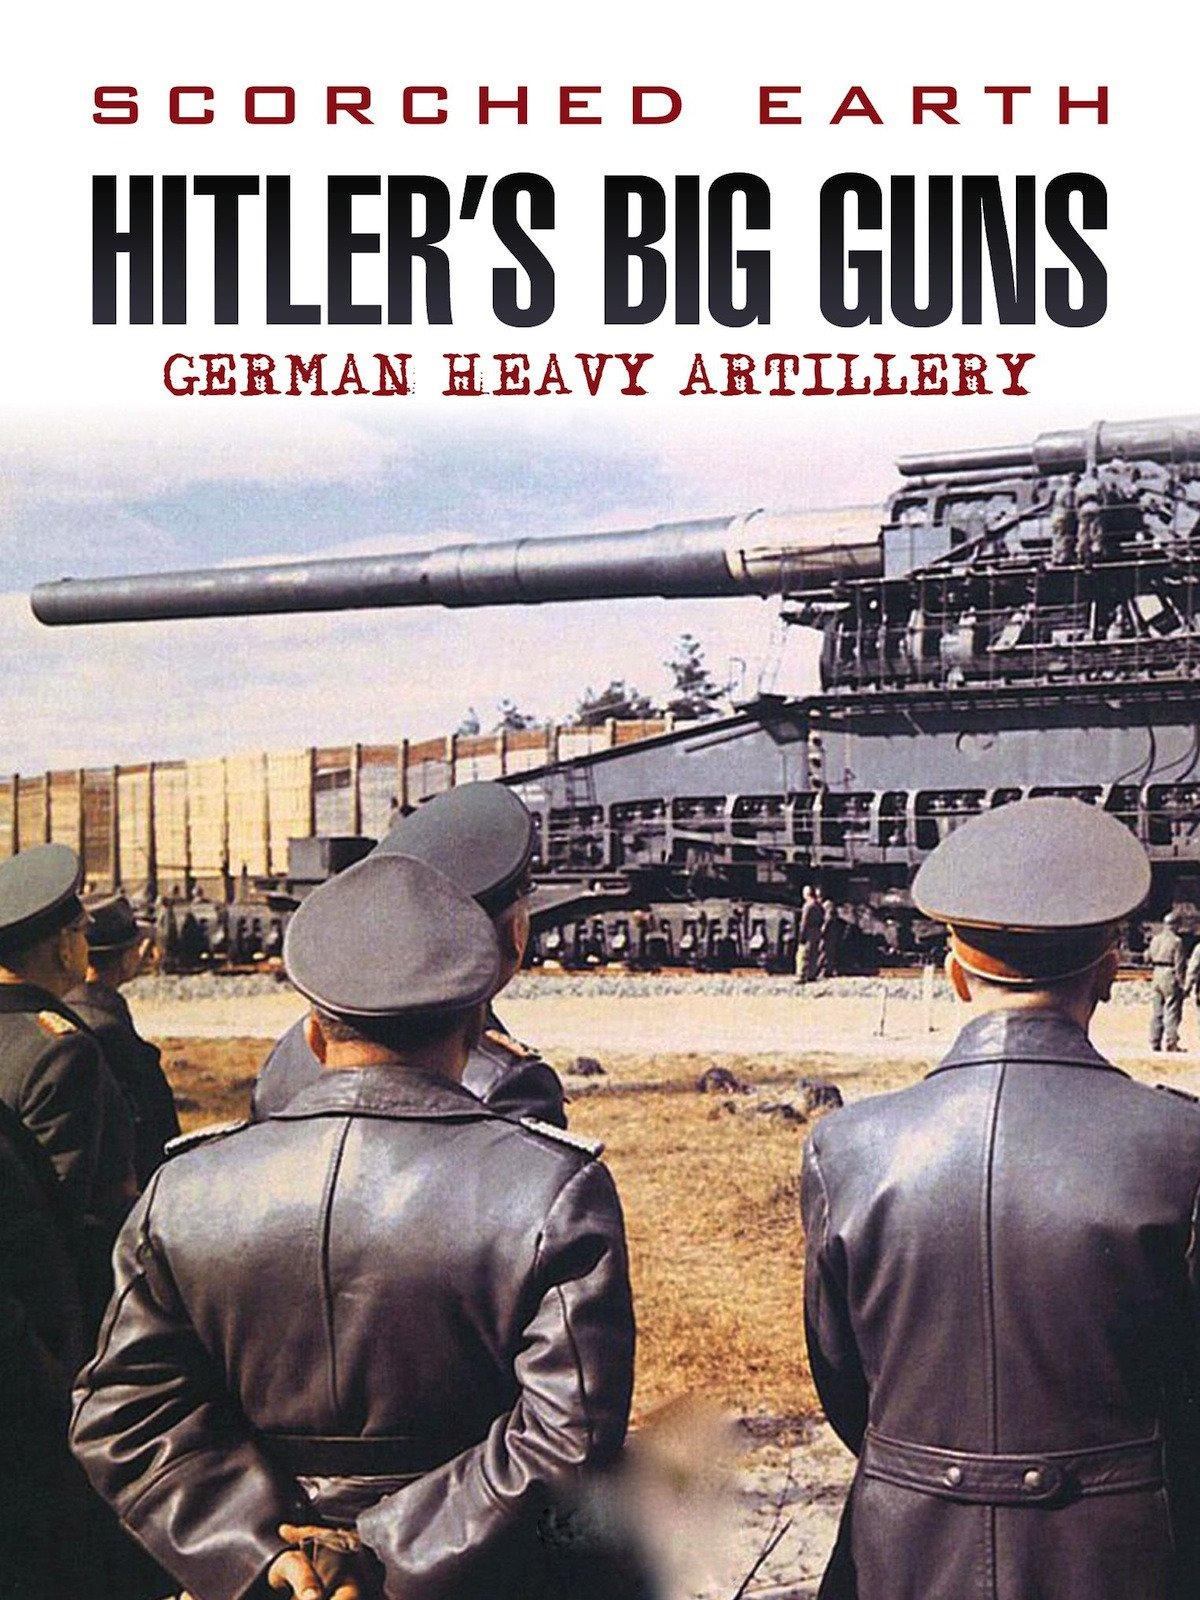 Scorched Earth: Hitler's Big Guns